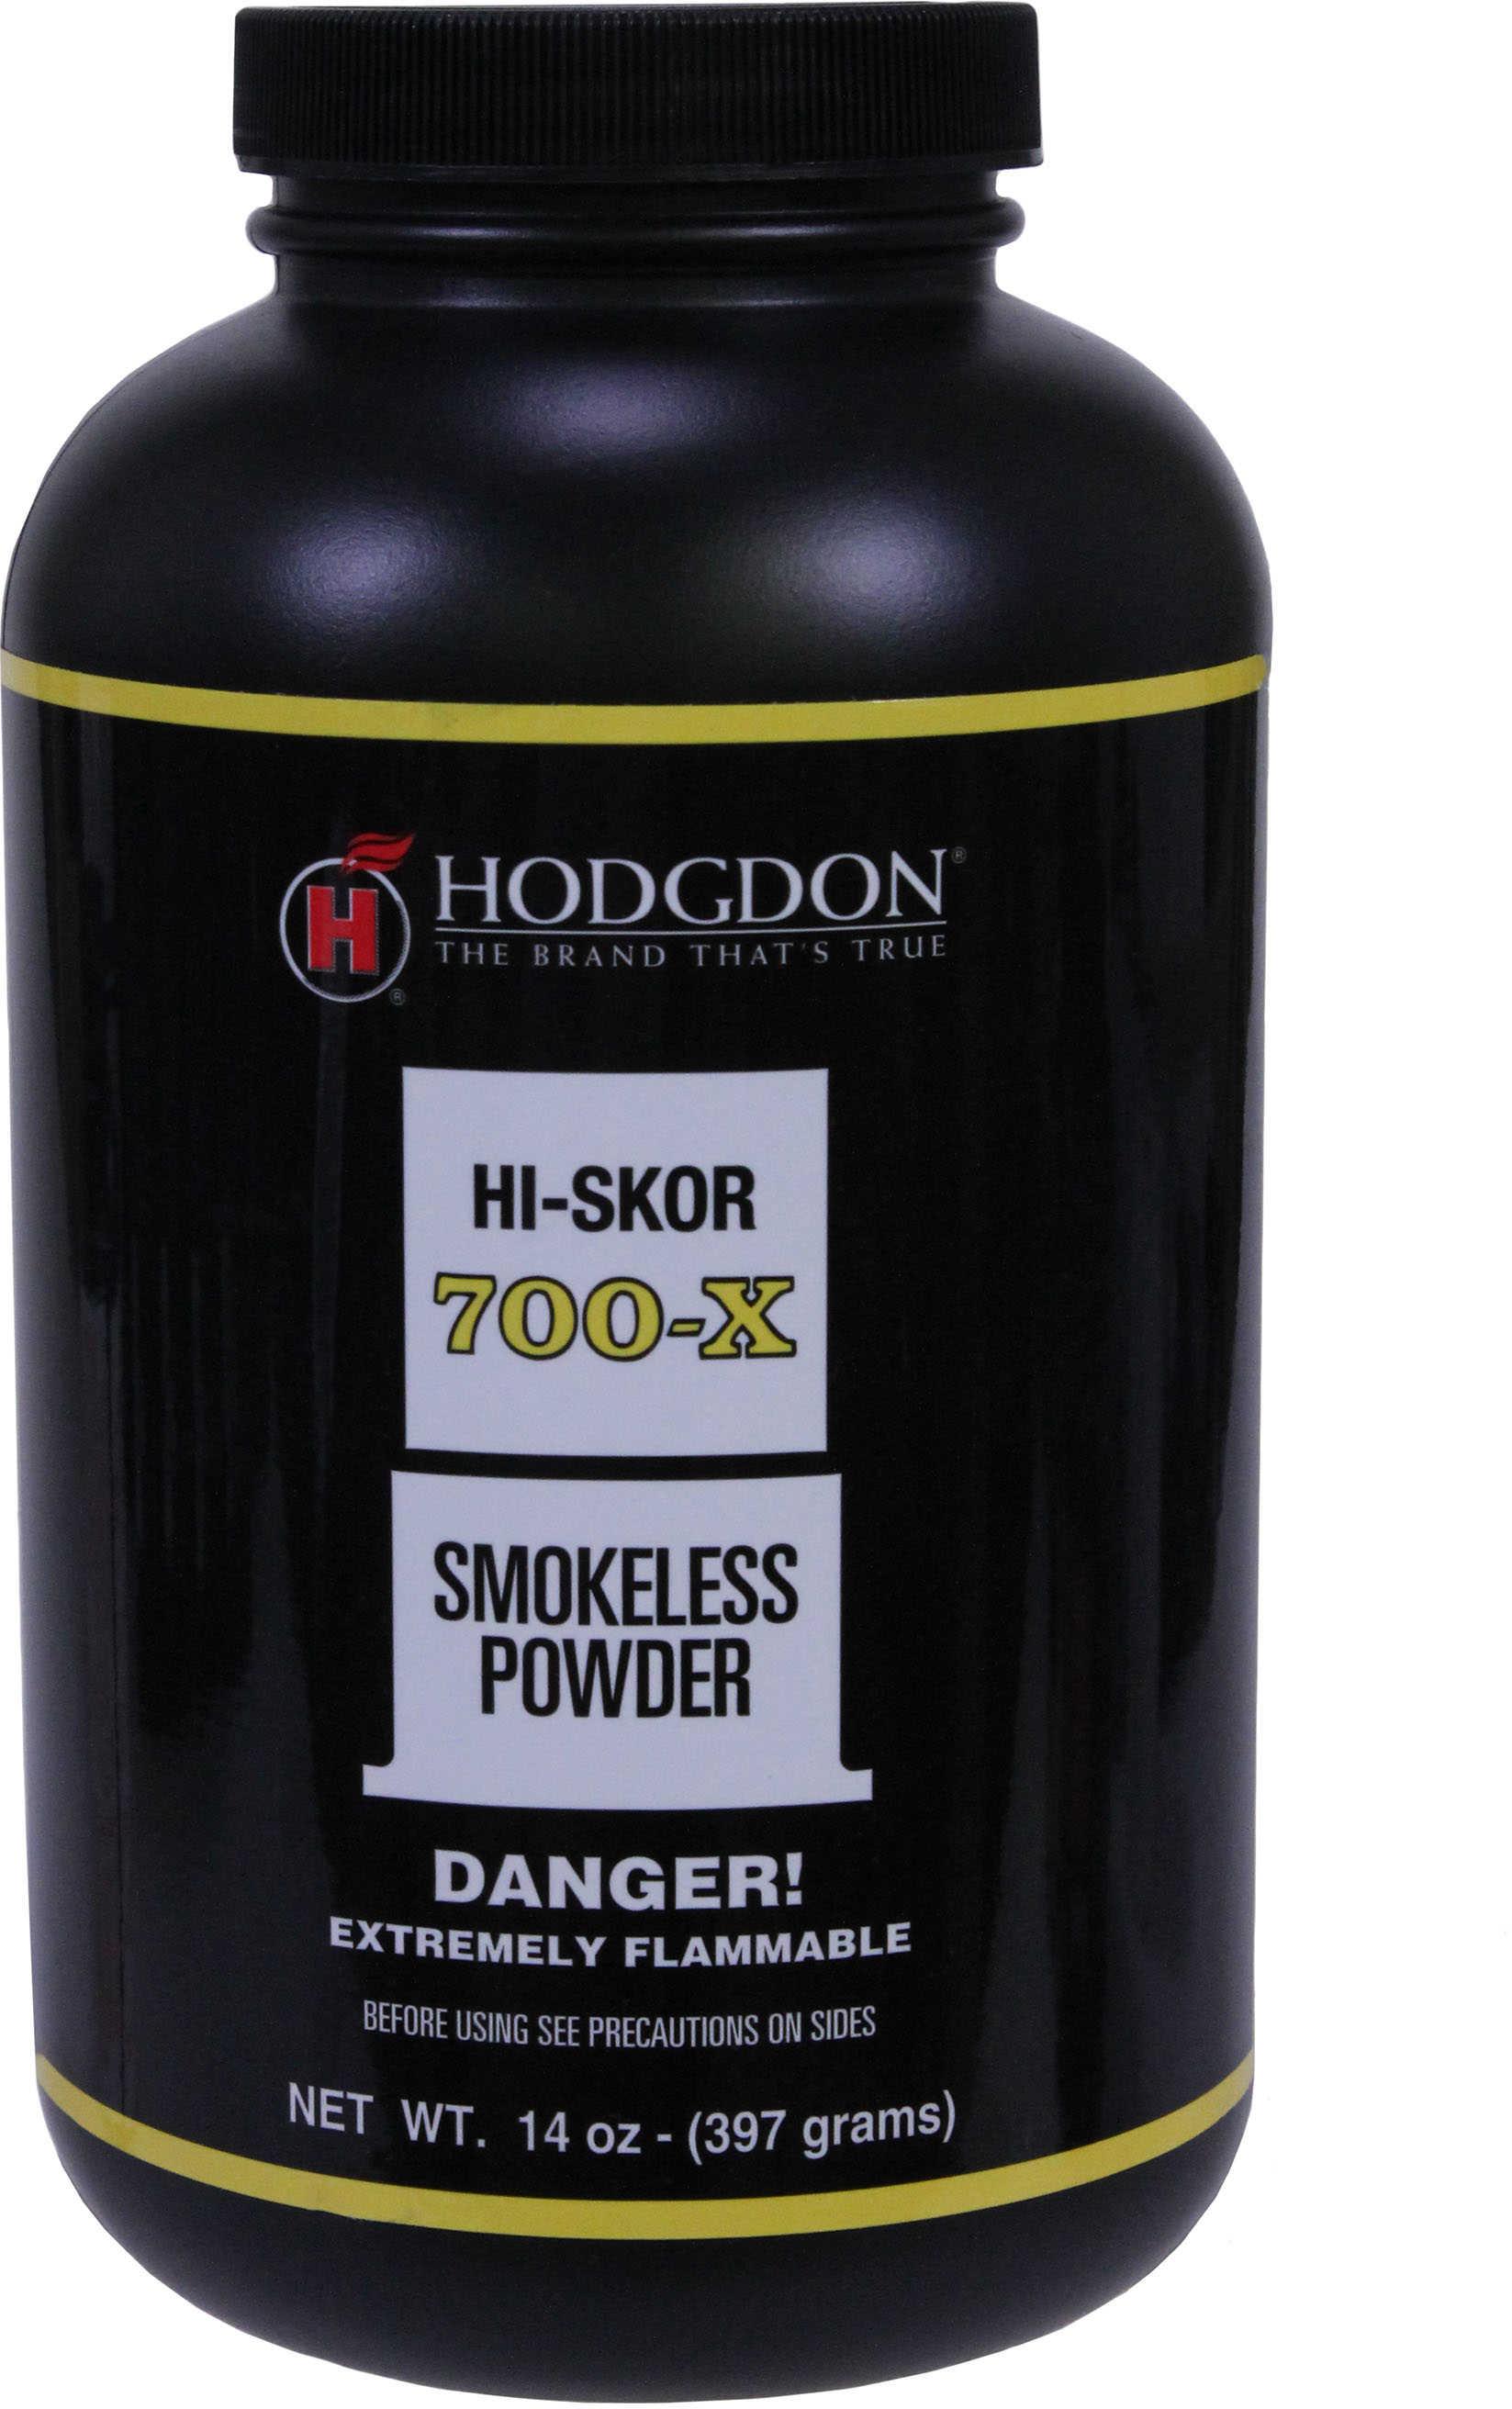 Hodgdon 700-X Powder 1Lb